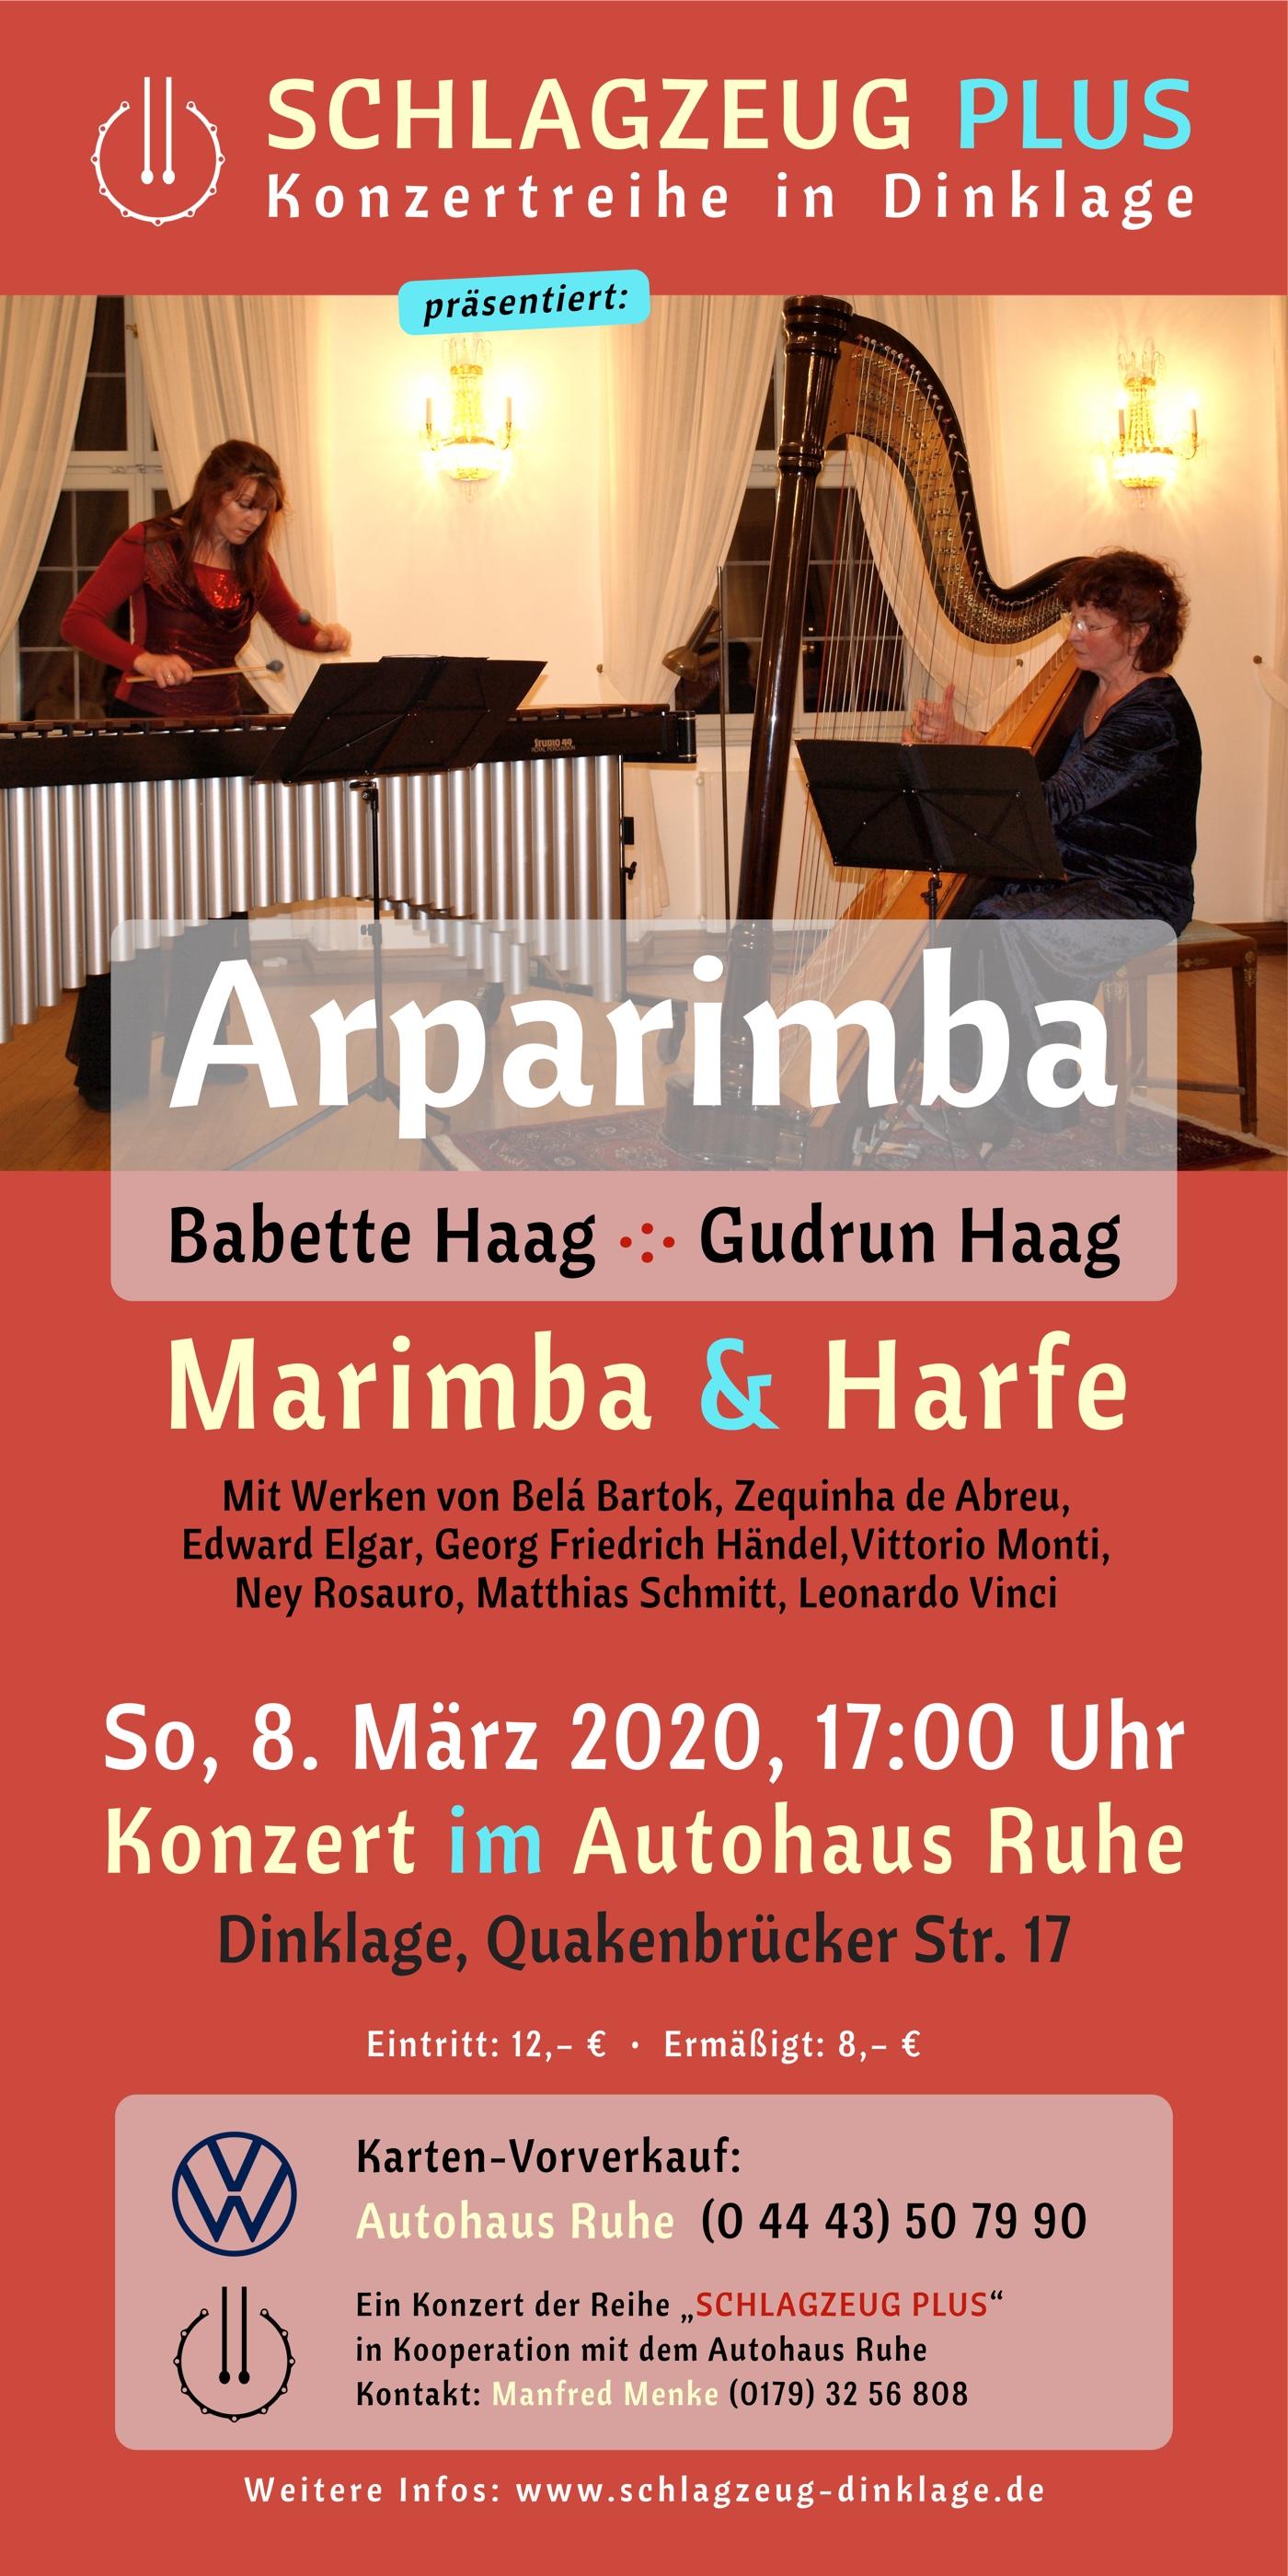 Plakat · ARPARIMBA · 8. März 2020